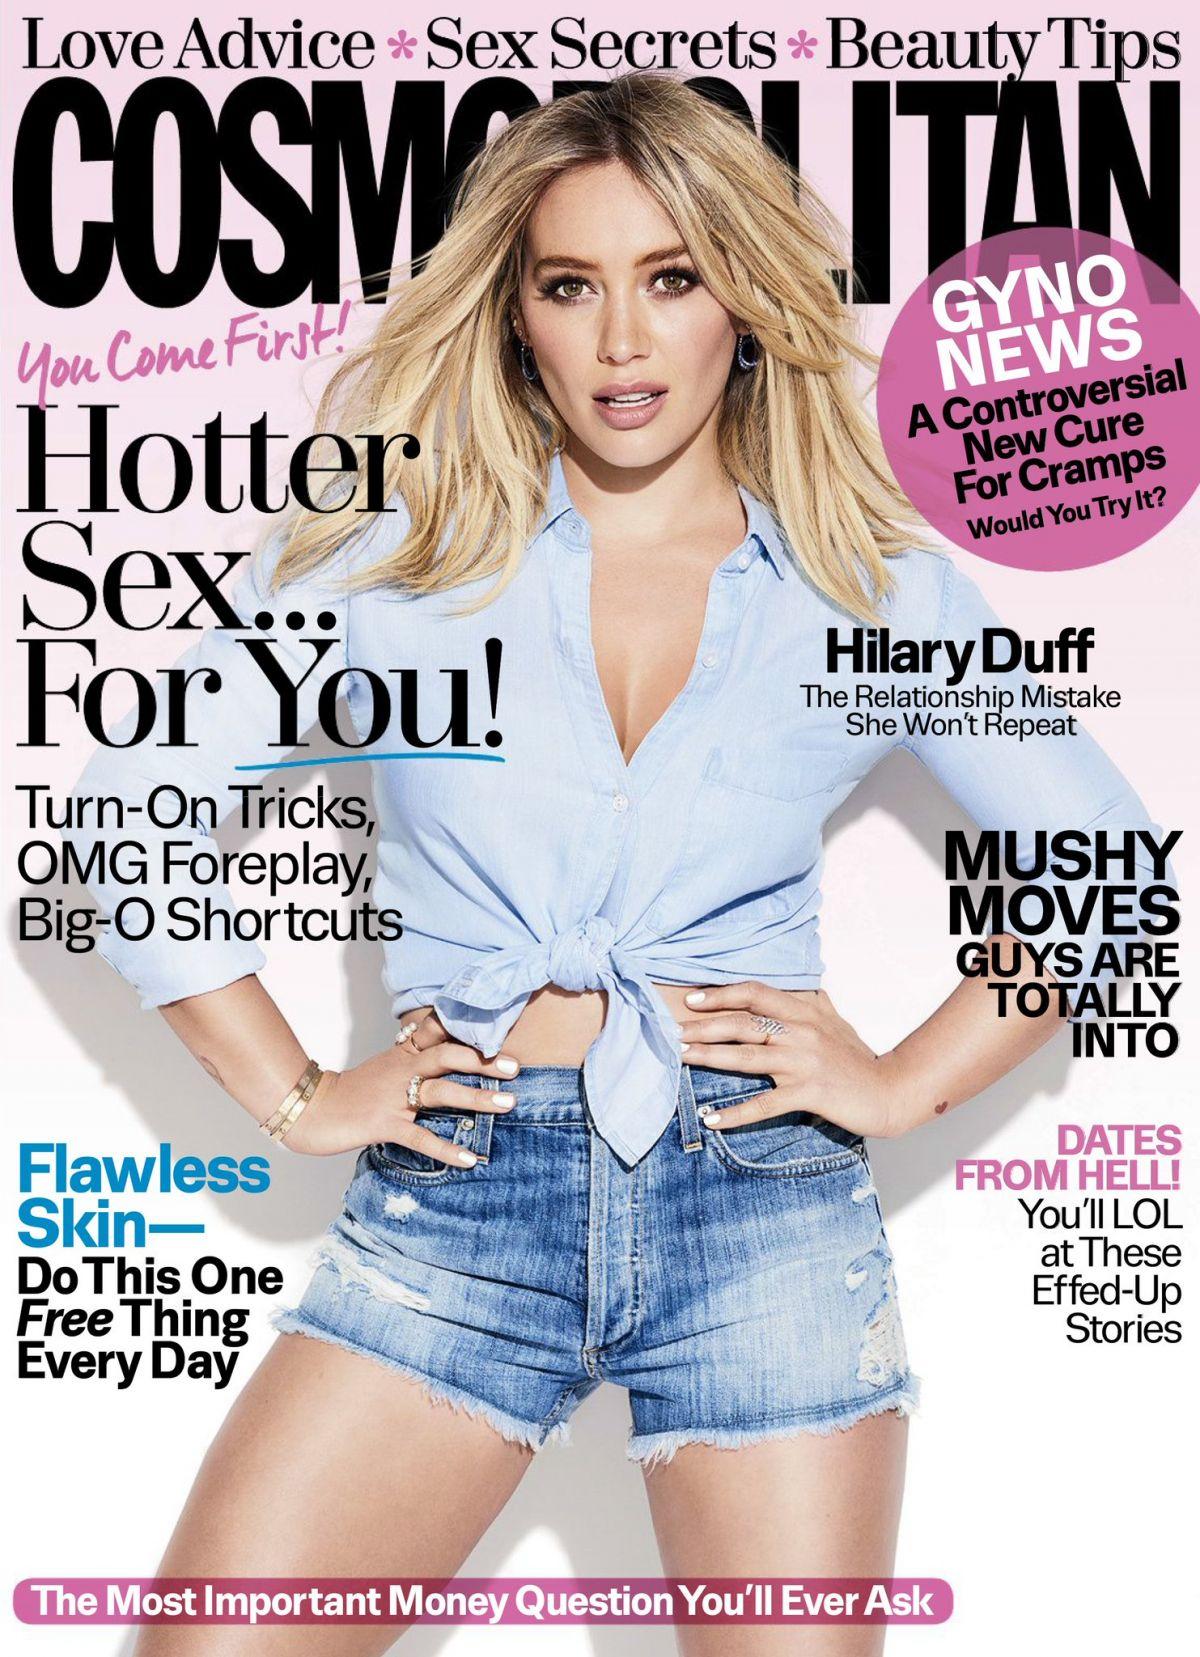 HILARY DUFF in Cosmopolitan Magazine, February 2017 Issue